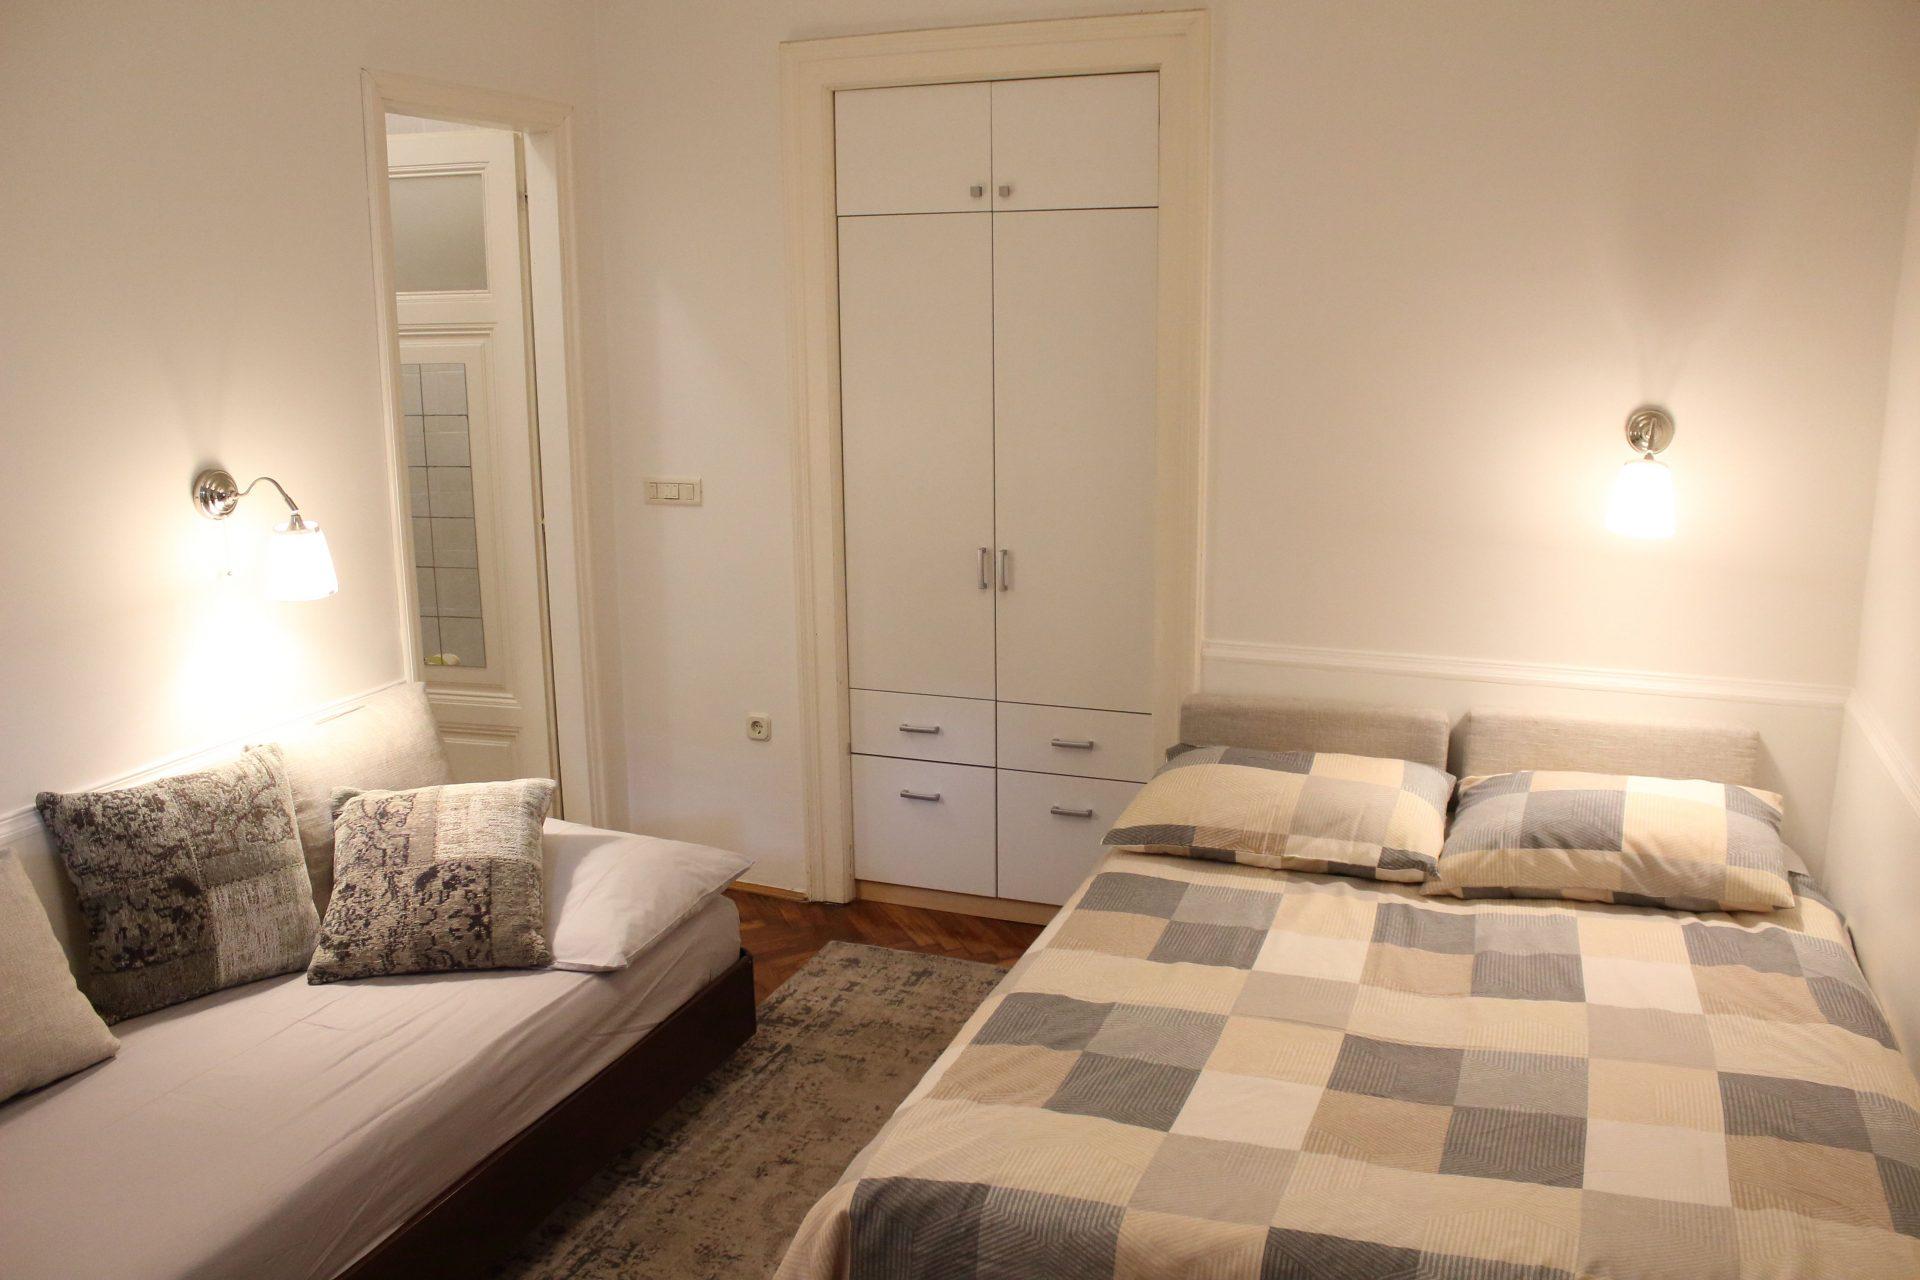 Villa San Giuseppe Lovran apartment 2+1 studio near beach